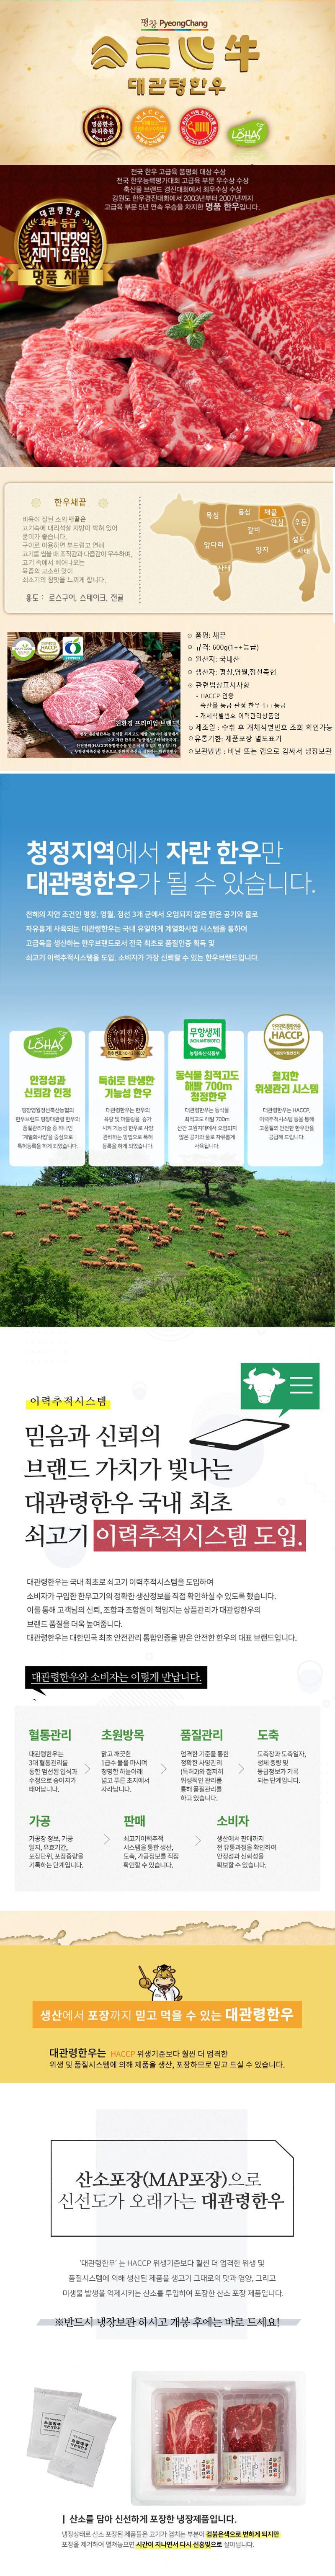 daekwoanlyenghanwoo_sang_chaekkuen_600g_1++.jpg